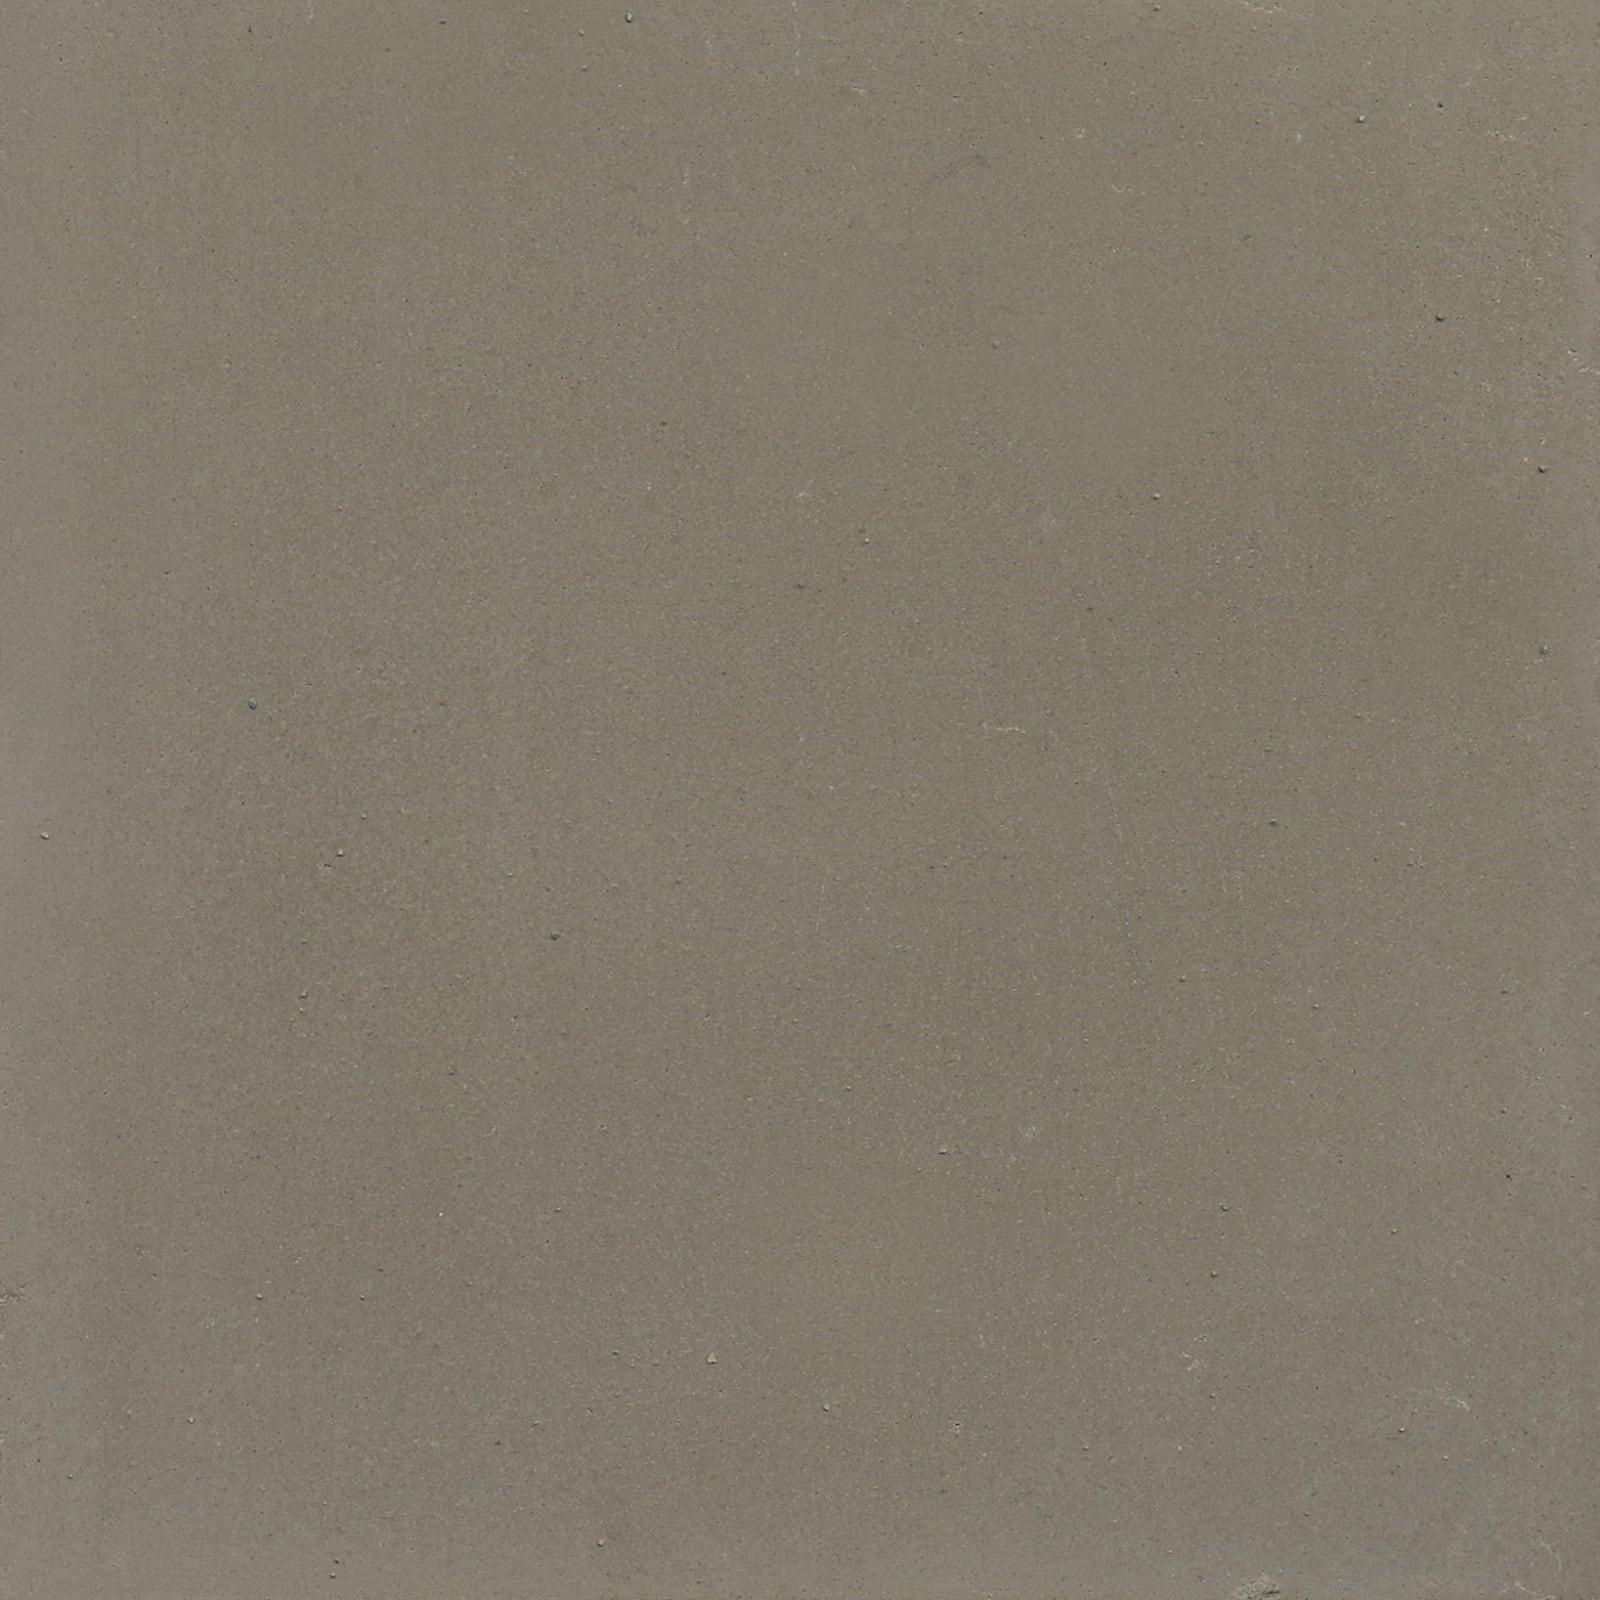 zementfliesen-terrazzofliesen-kreidefarbe-terrazzo-fugenlos-viaplatten-54 | 054